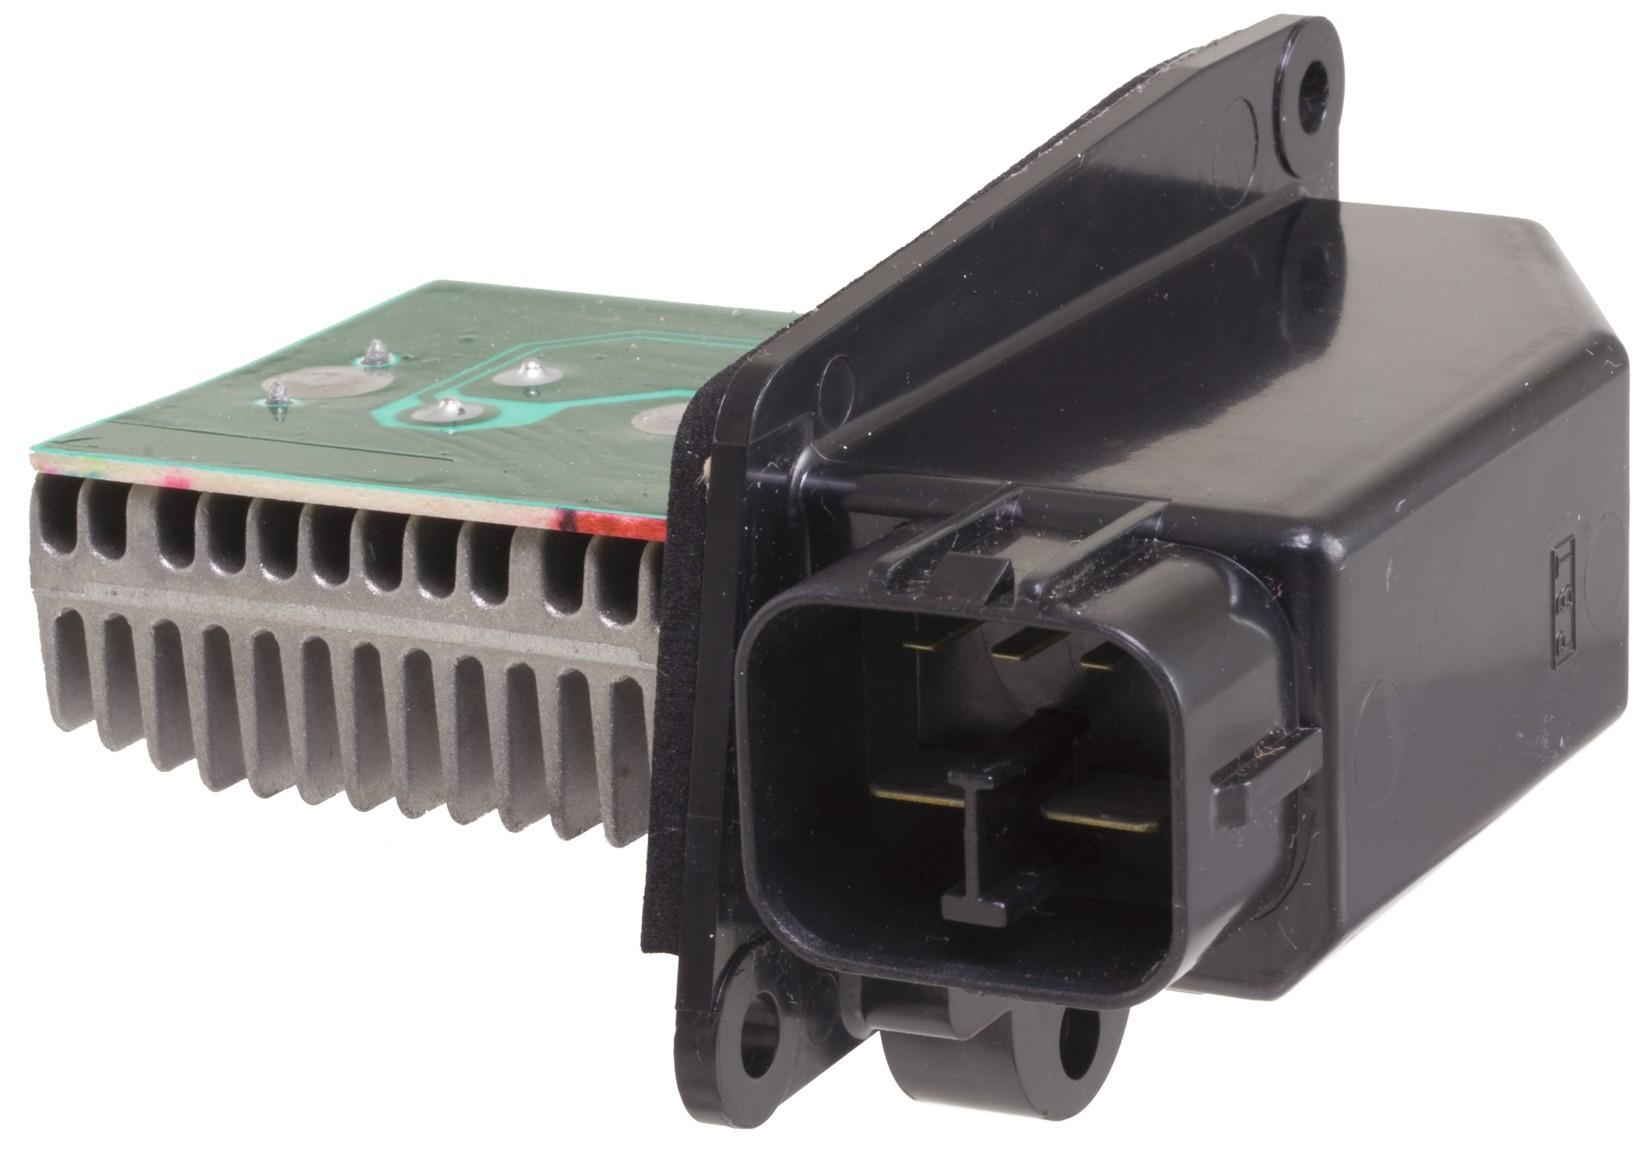 Hvac blower motor resistor airtex 4p1587 ebay for Hvac blower motor resistor